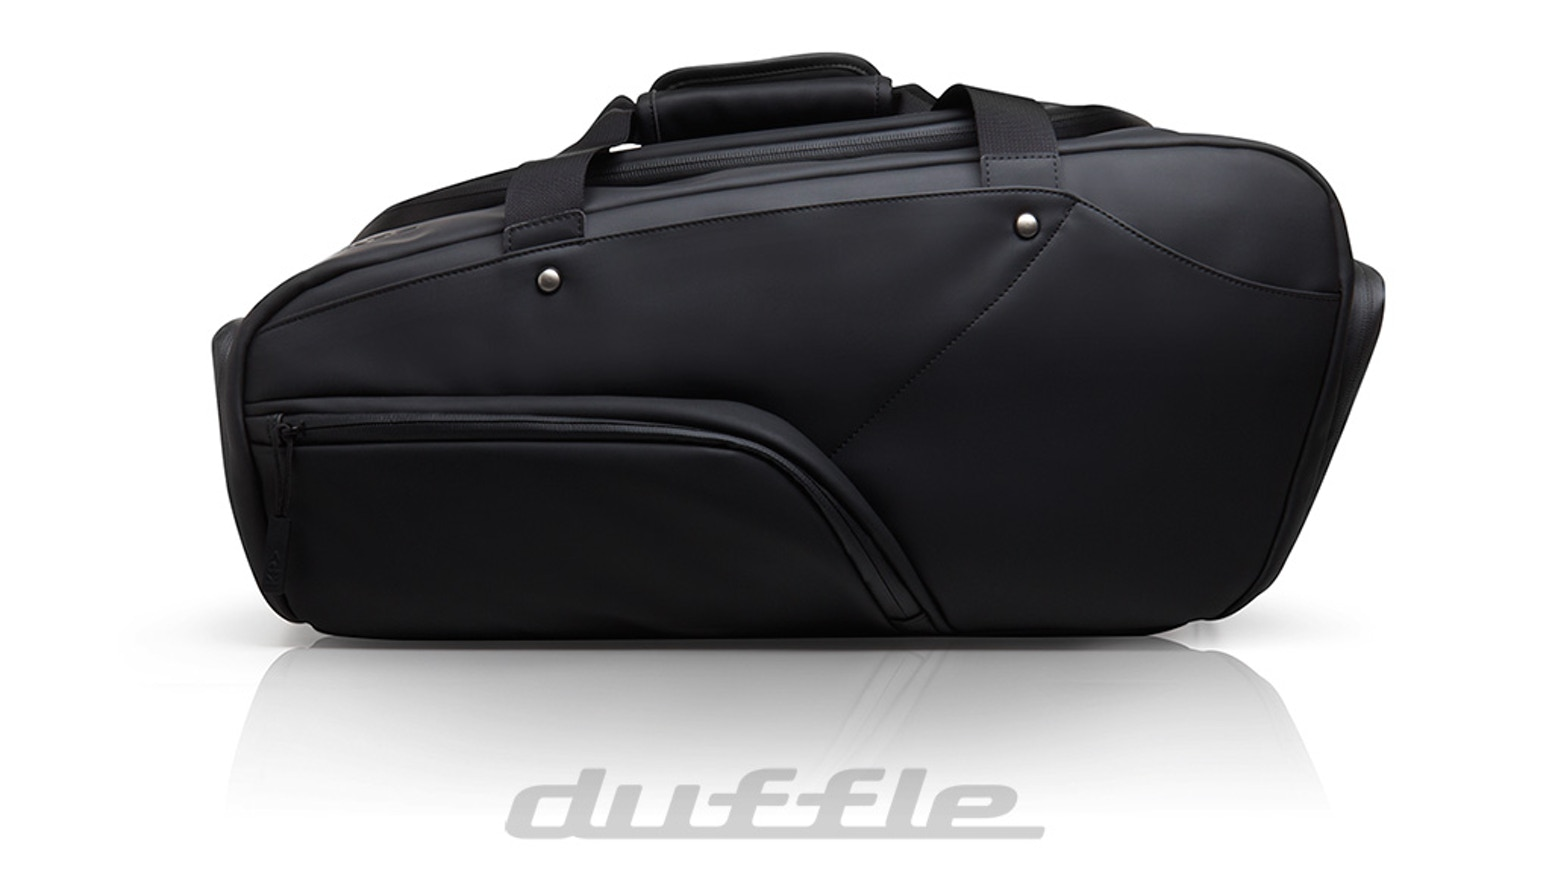 7175d8a12df9 KP Duffle - The Ultimate Travel Bag by Keep Pursuing — Kickstarter